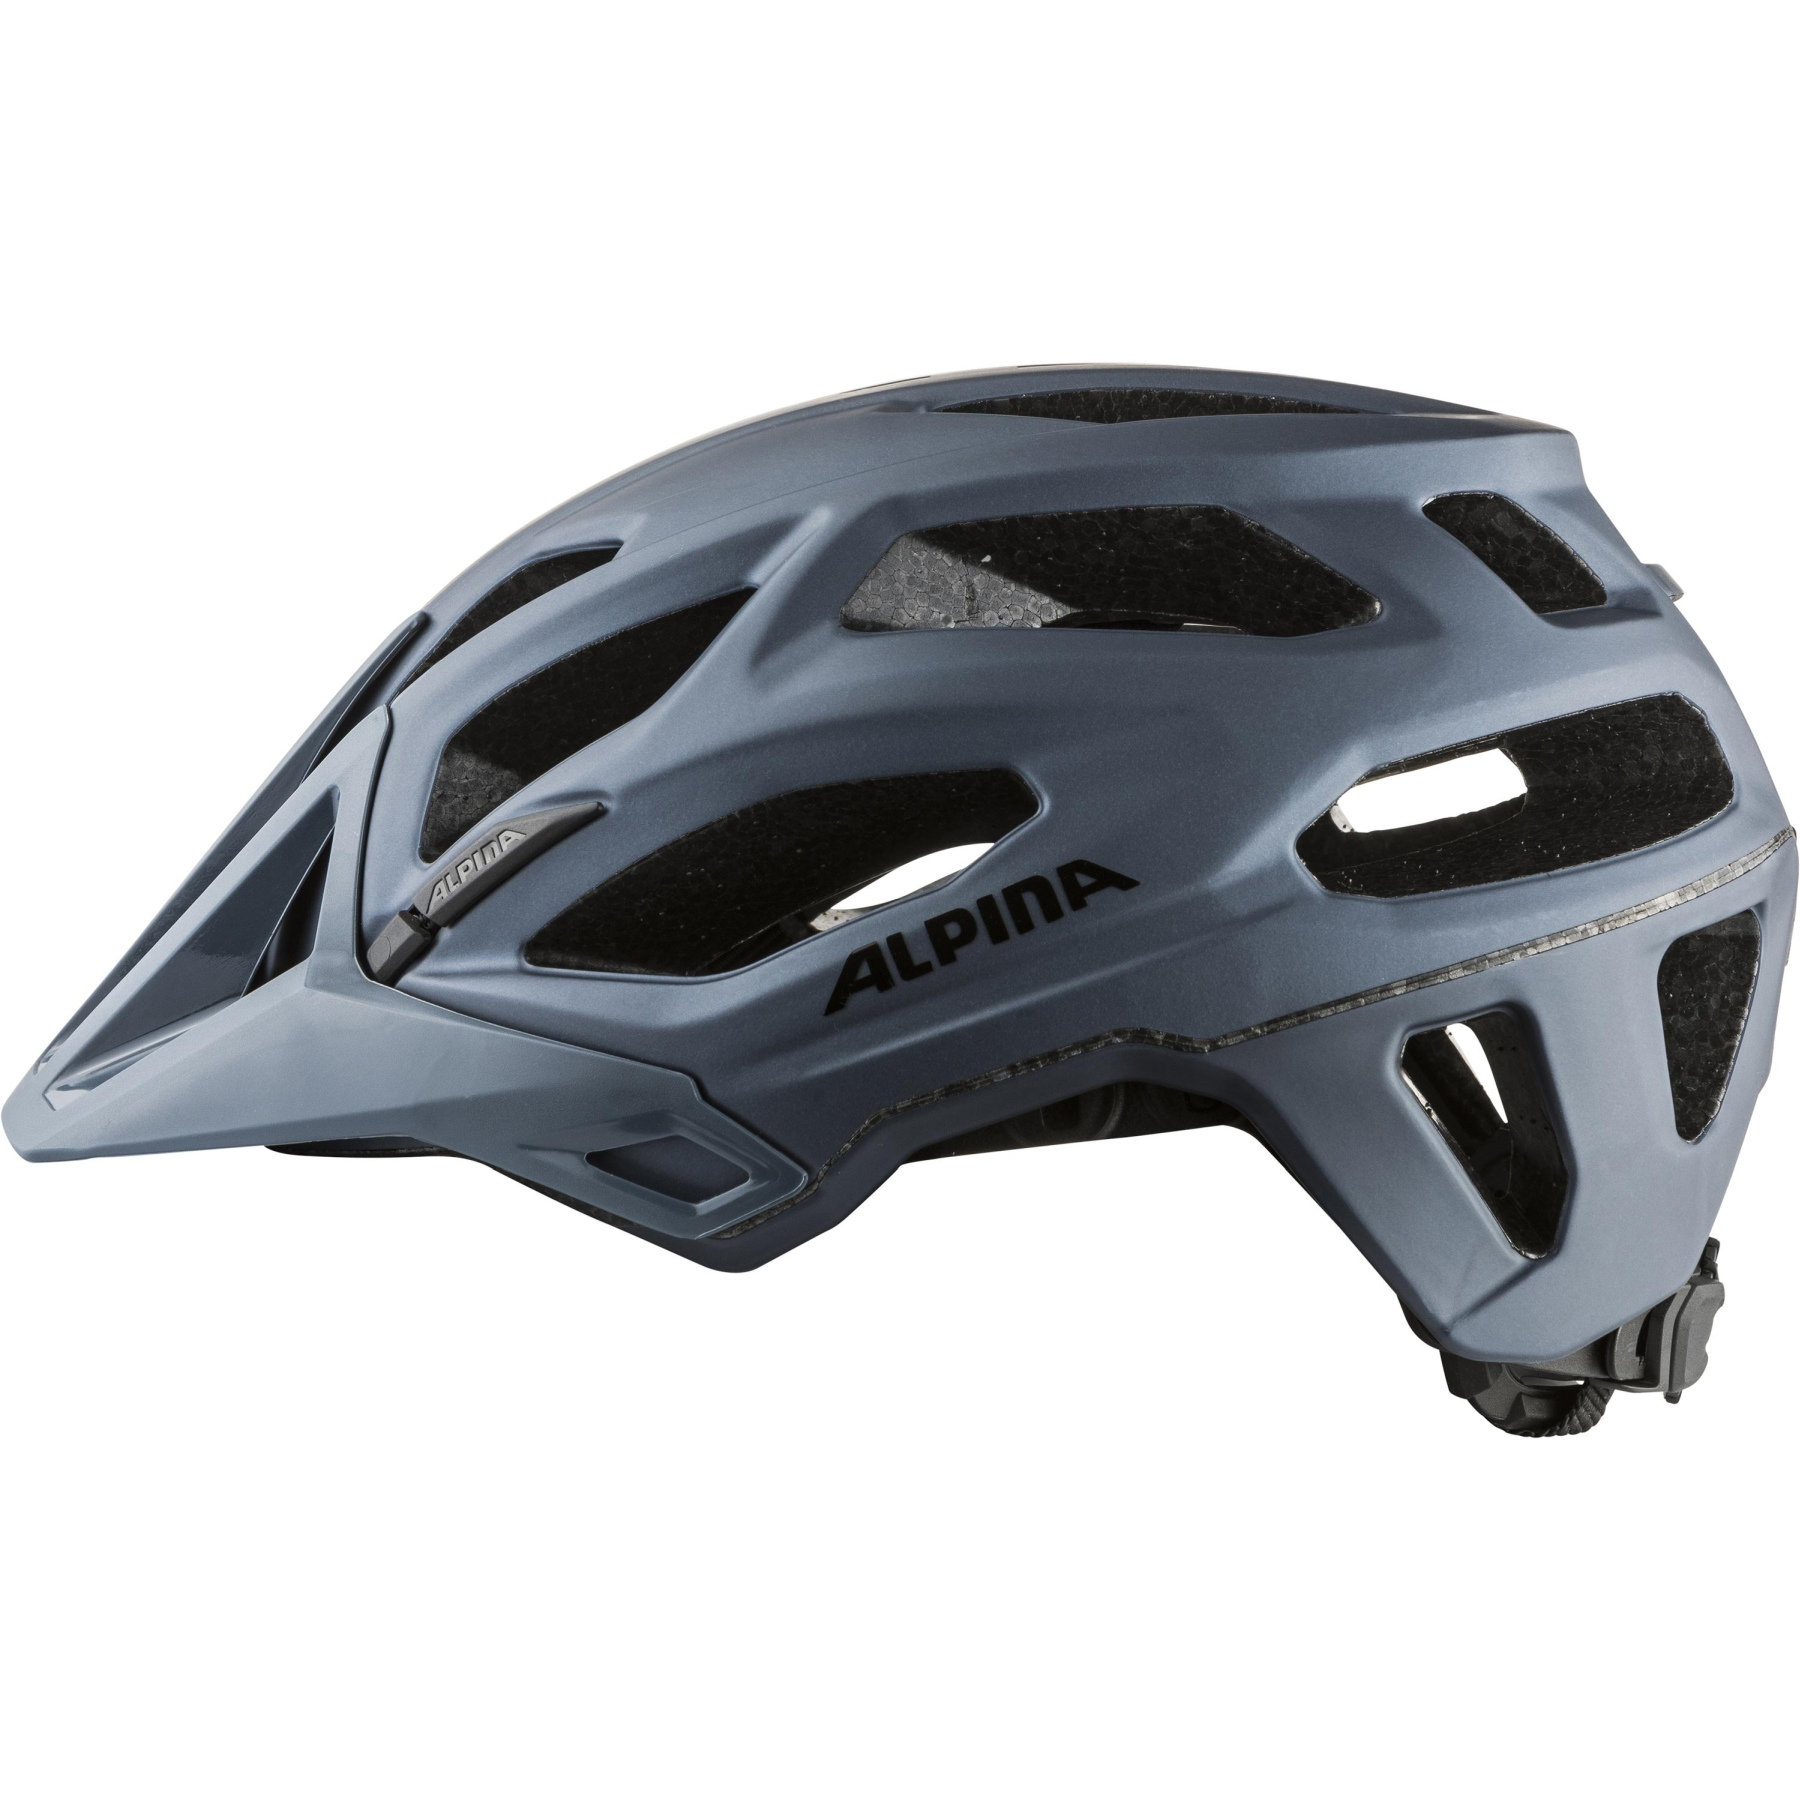 Image of Alpina Garbanzo Helmet - indigo matt